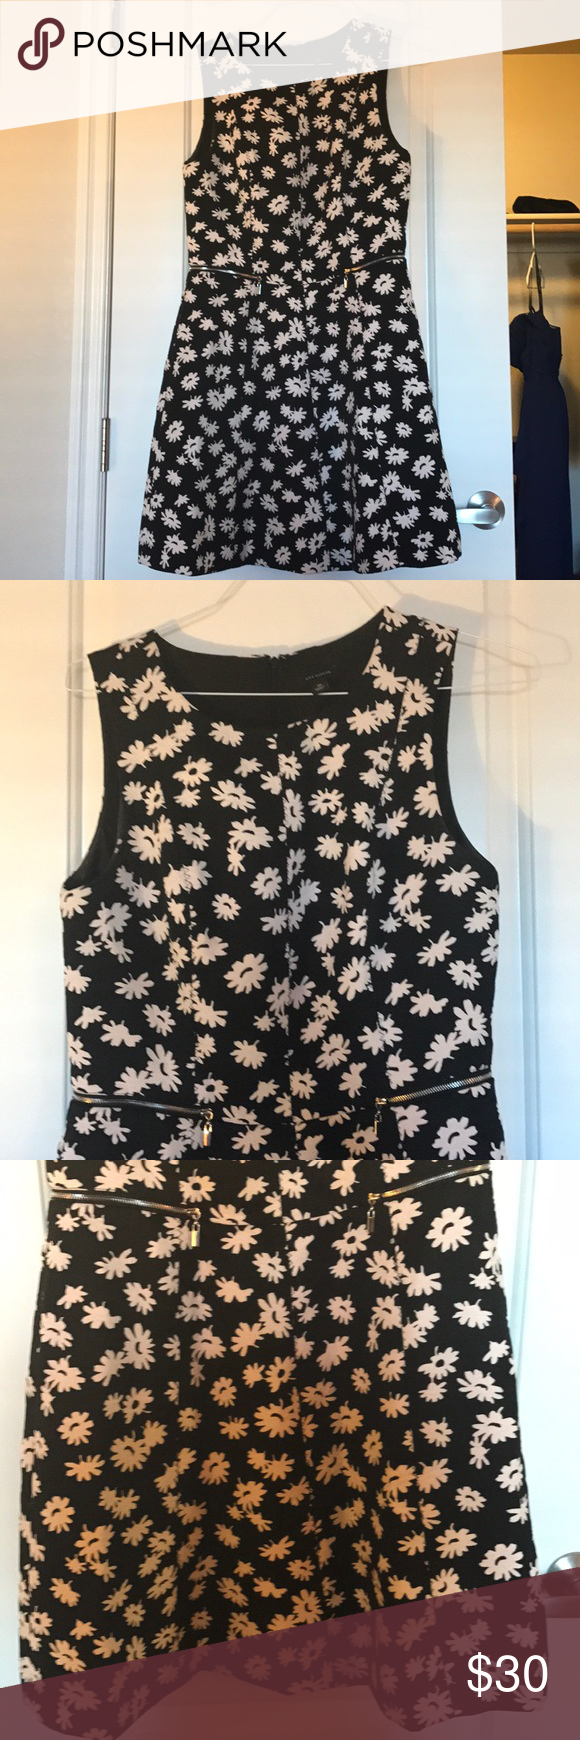 Ann Taylor Black And White Flower Dress Flower Dresses Size 10